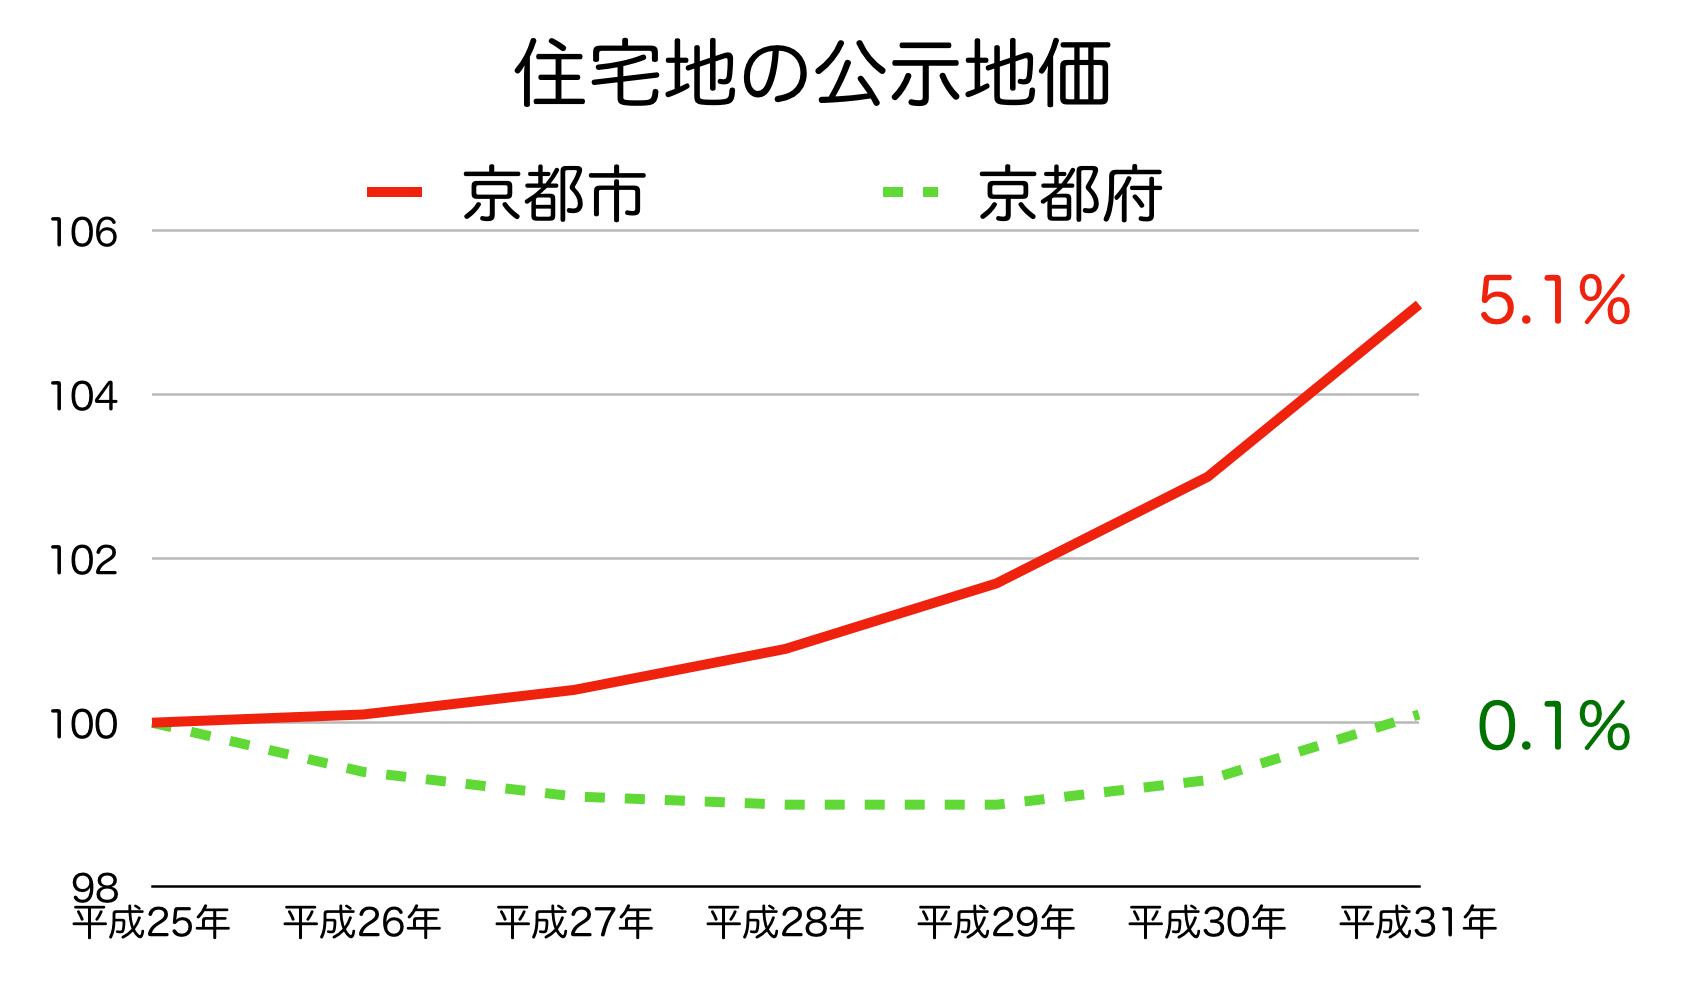 京都市の公示地価 H25-H31